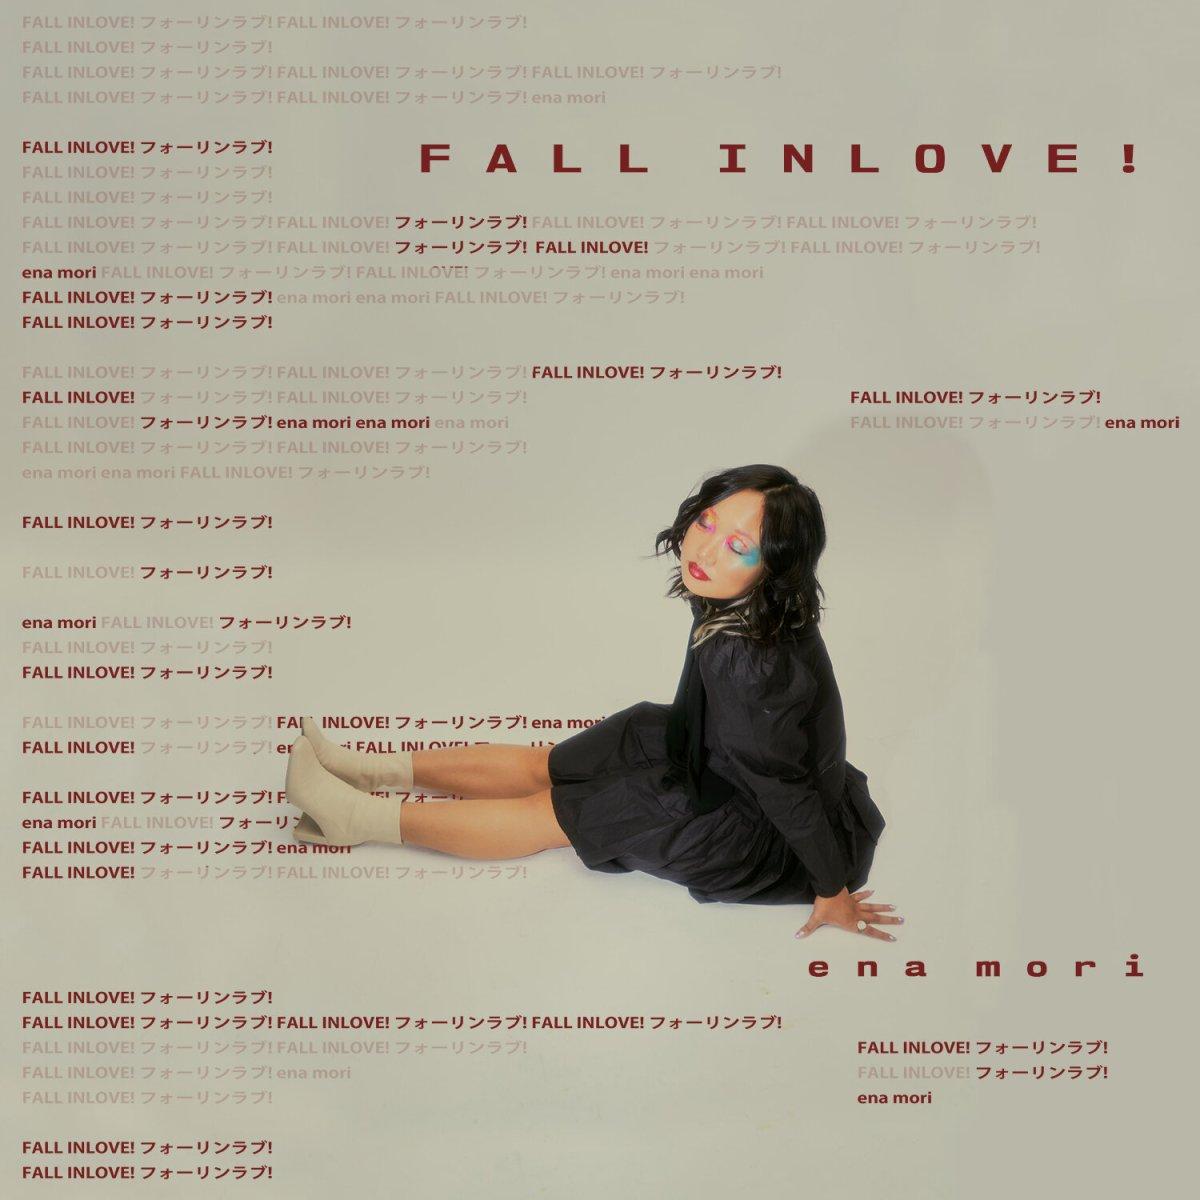 ena_fall-in-love.jpg